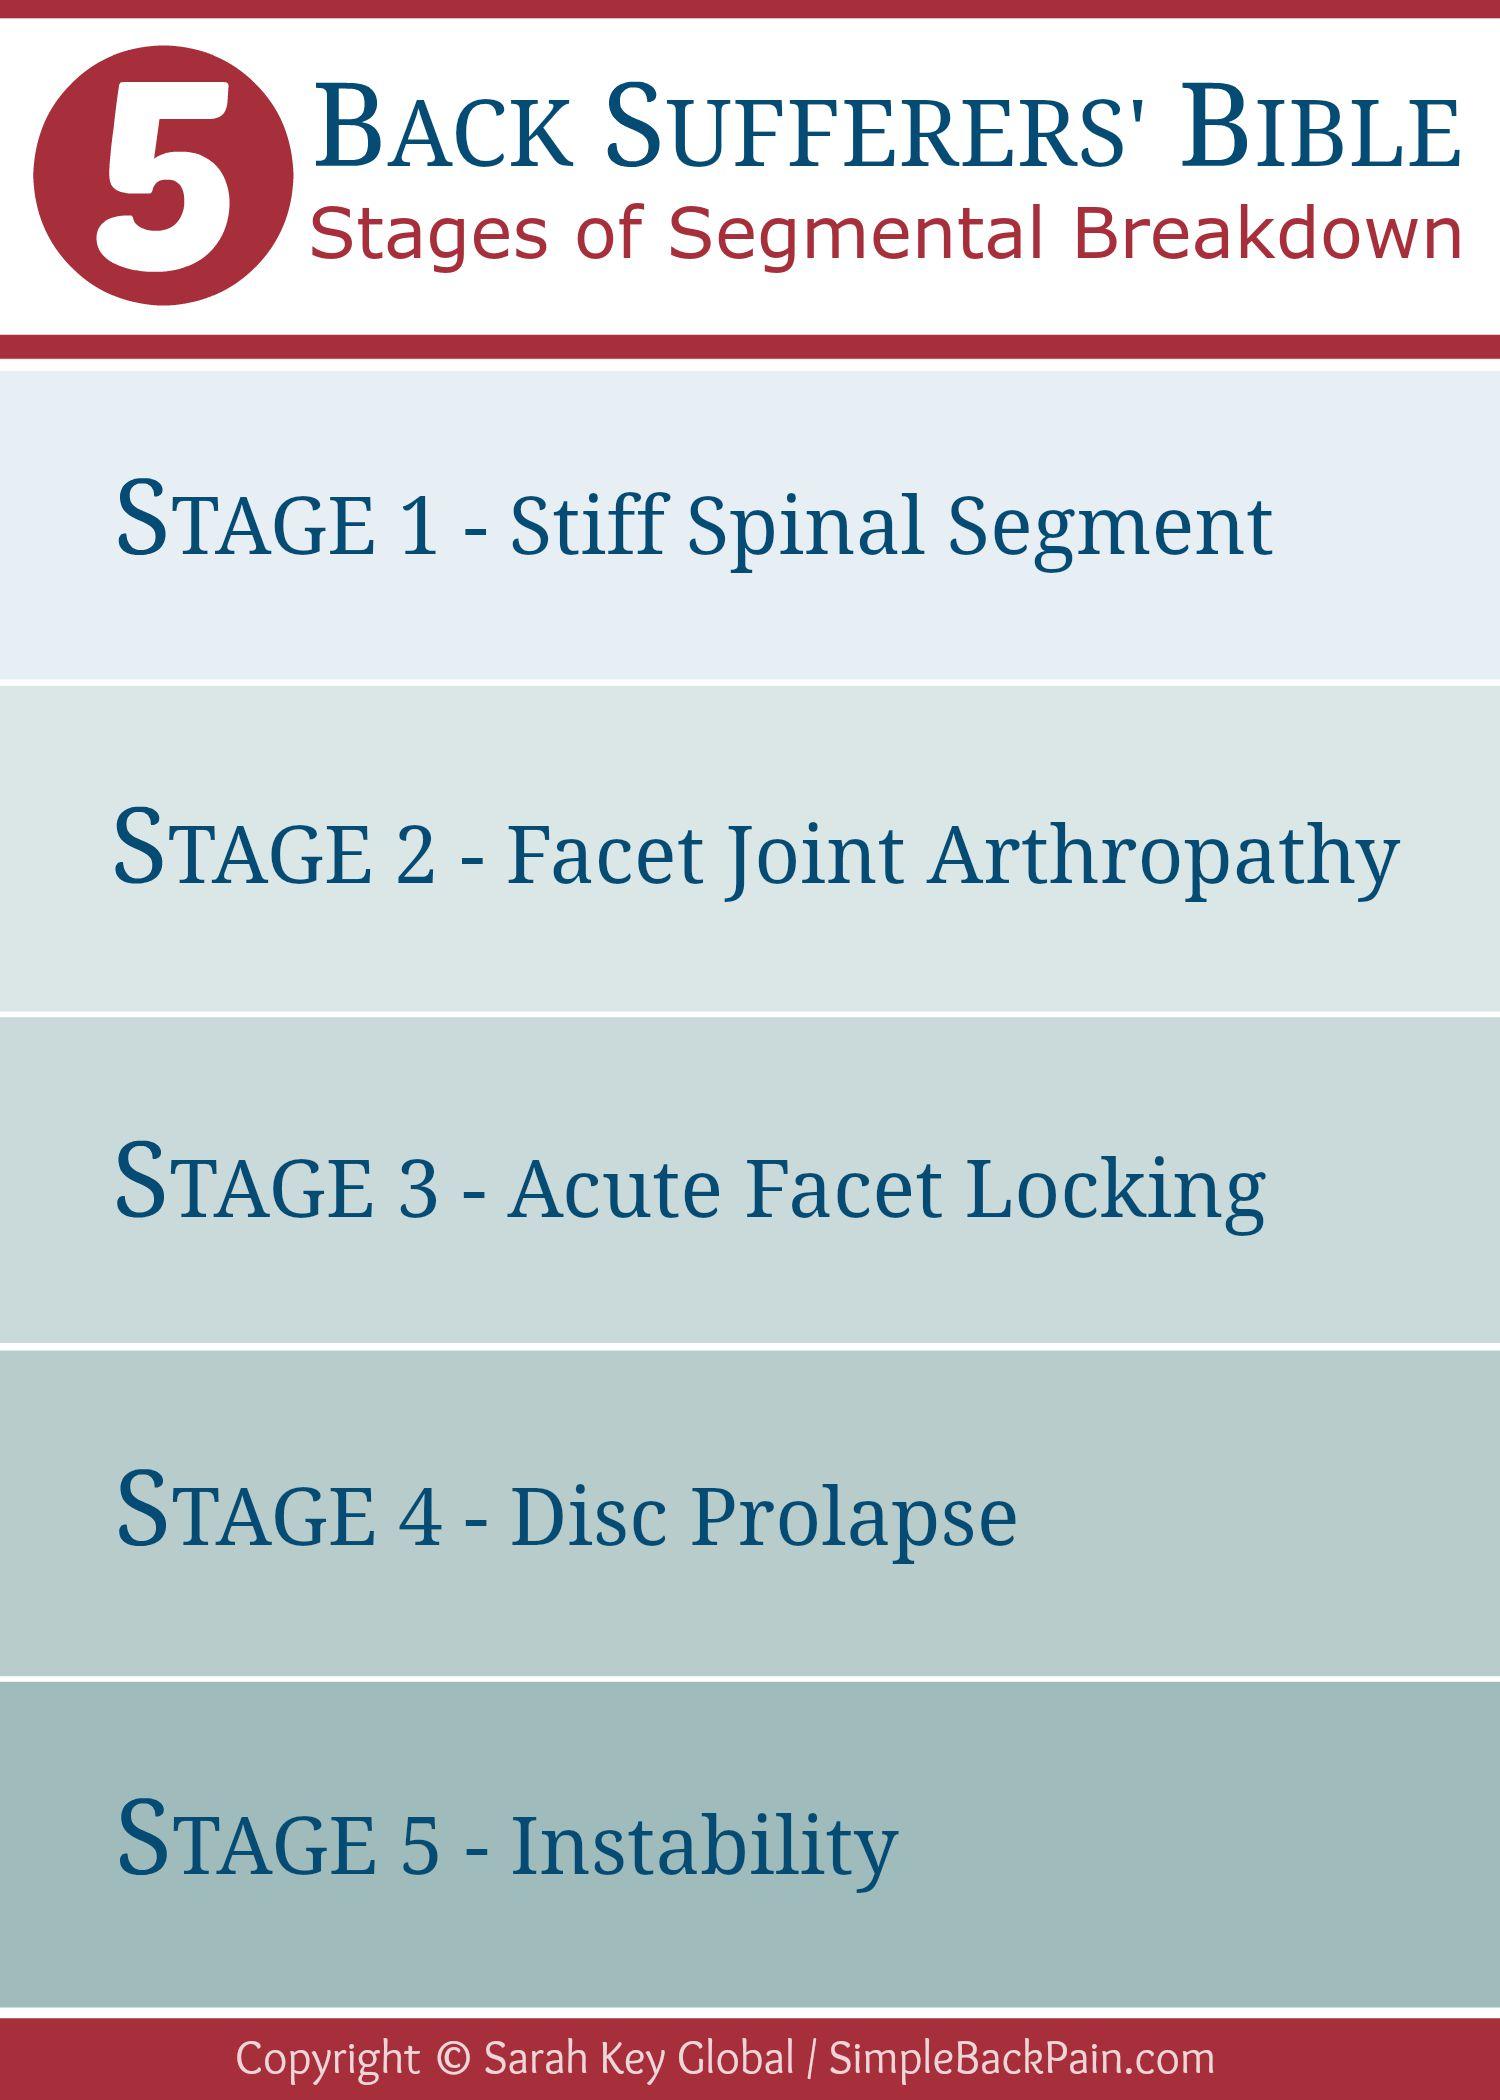 Stages of Segmental Breakdown Back Sufferers Bible